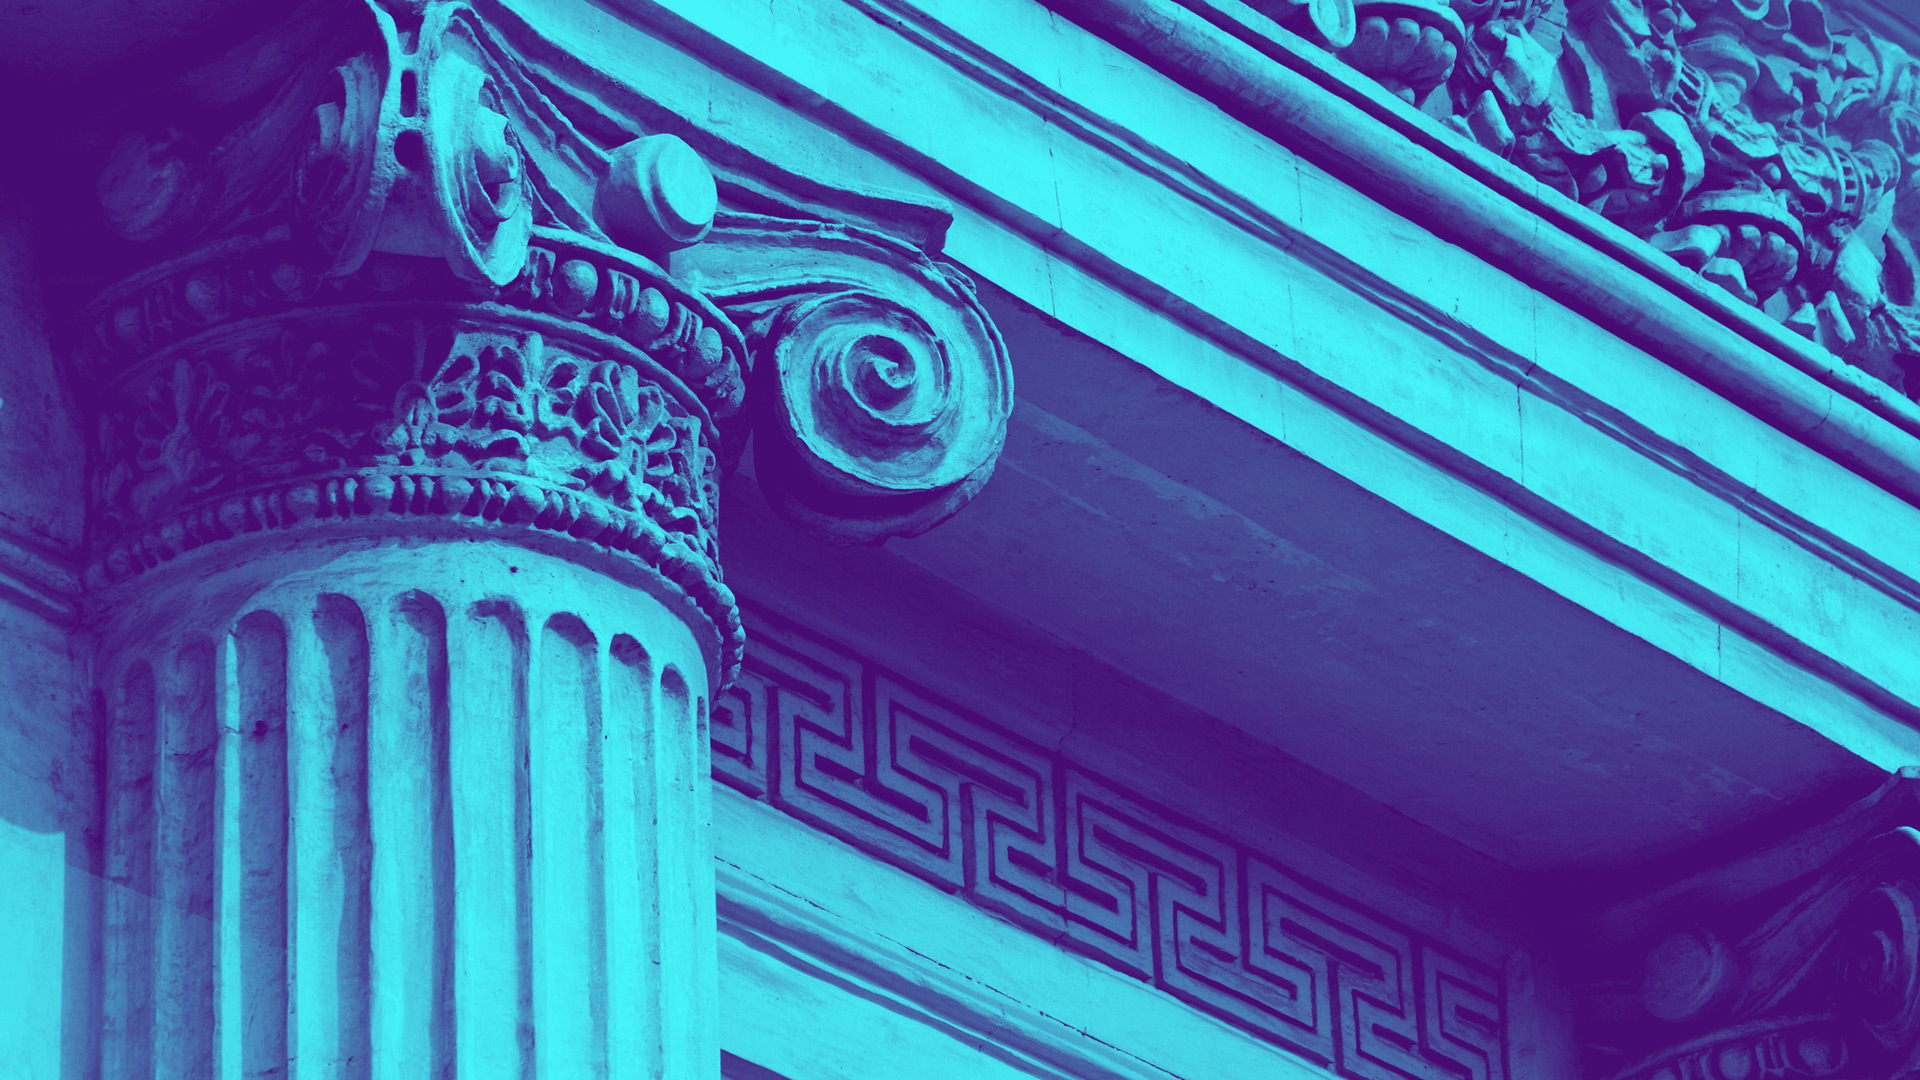 Nebraska bill creating bank framework for digital asset firms signed into law